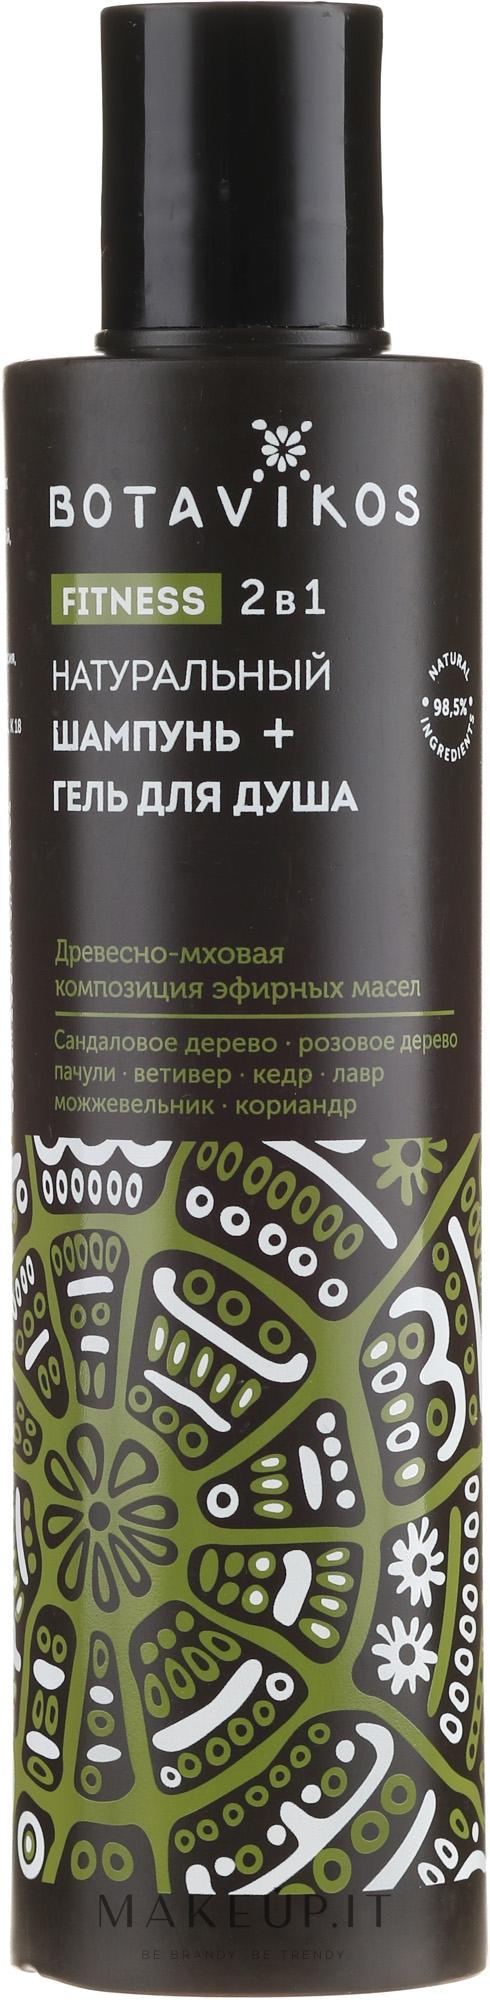 "Shampoo + gel doccia 2in1 ""Fitness"" - Botavikos Shampoo+Shower Gel — foto 200 ml"